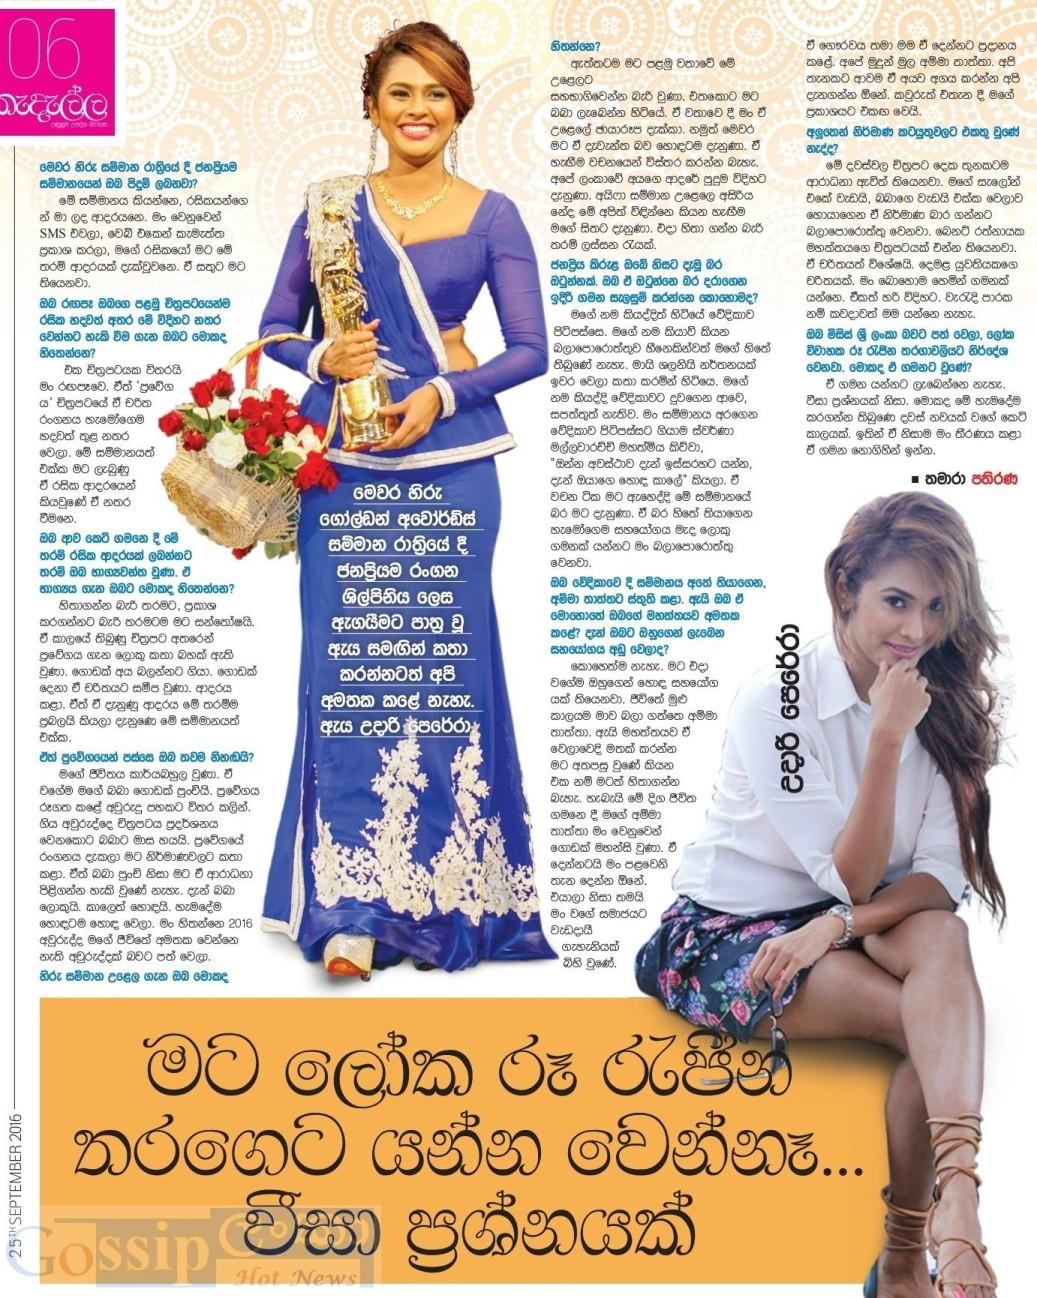 Gossip Chat With Actress Udari Perera | Gossip Lanka Hot News